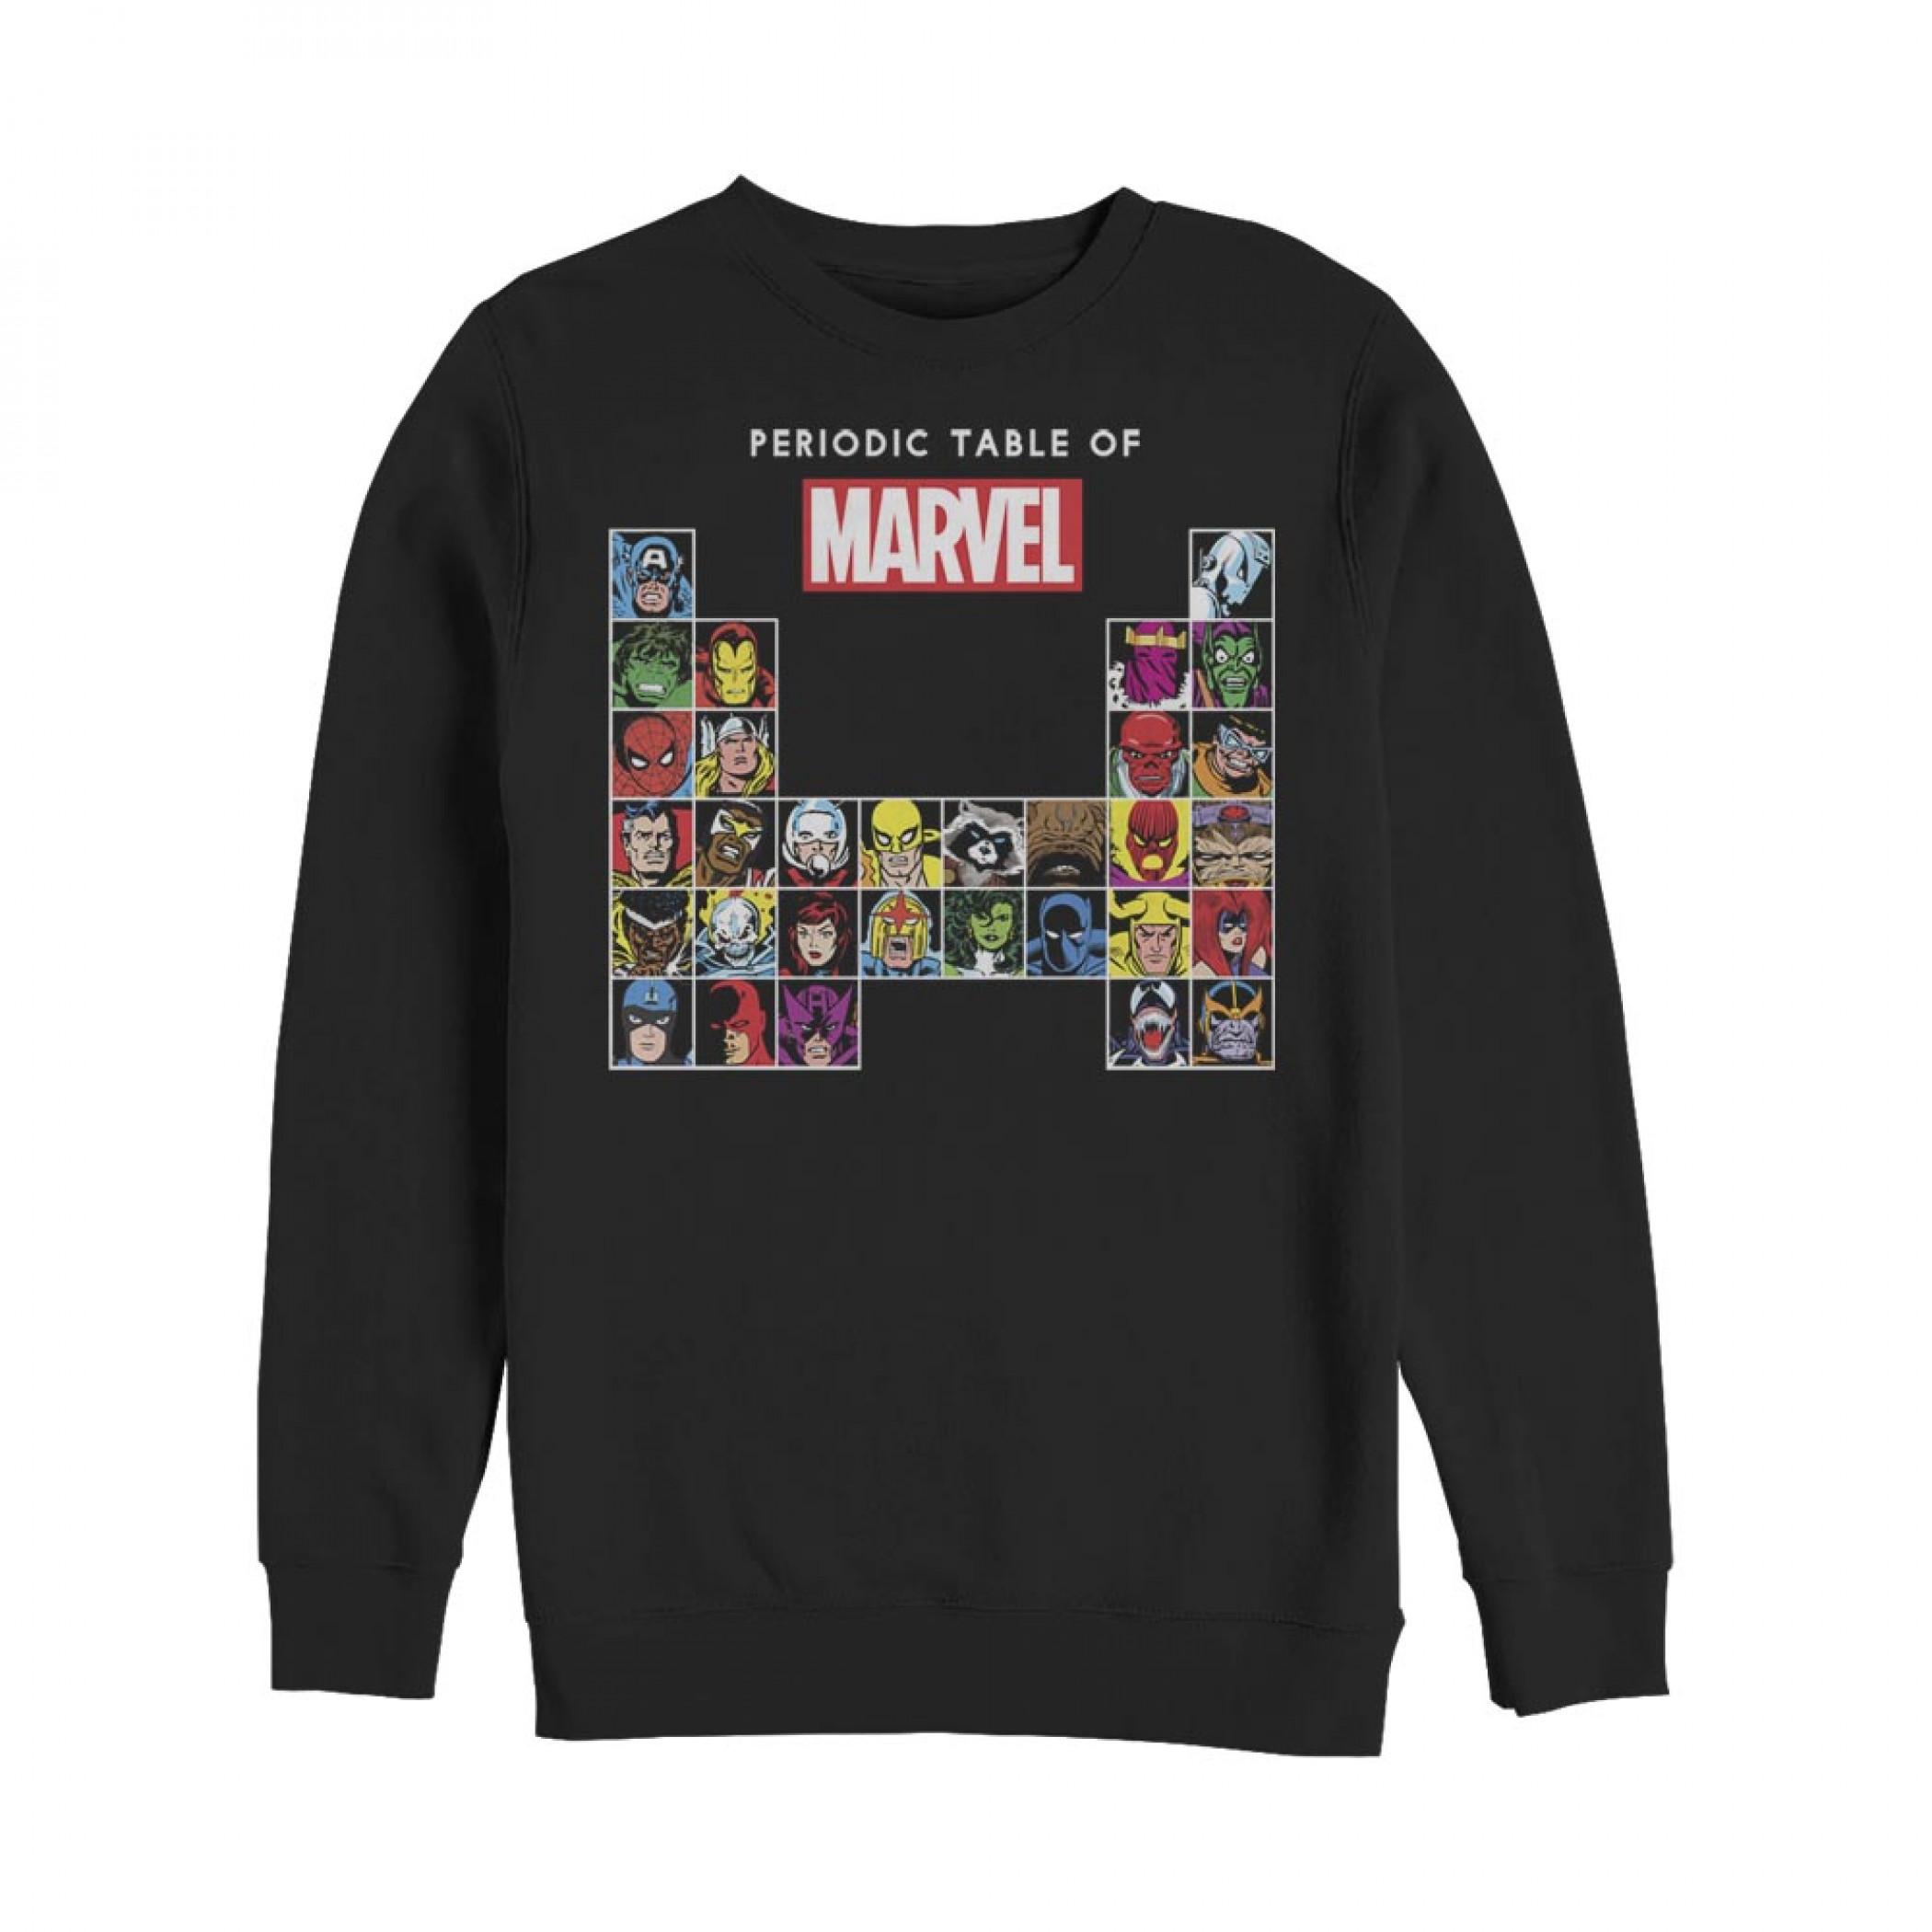 Marvel Periodic Table of Heroes Sweatshirt